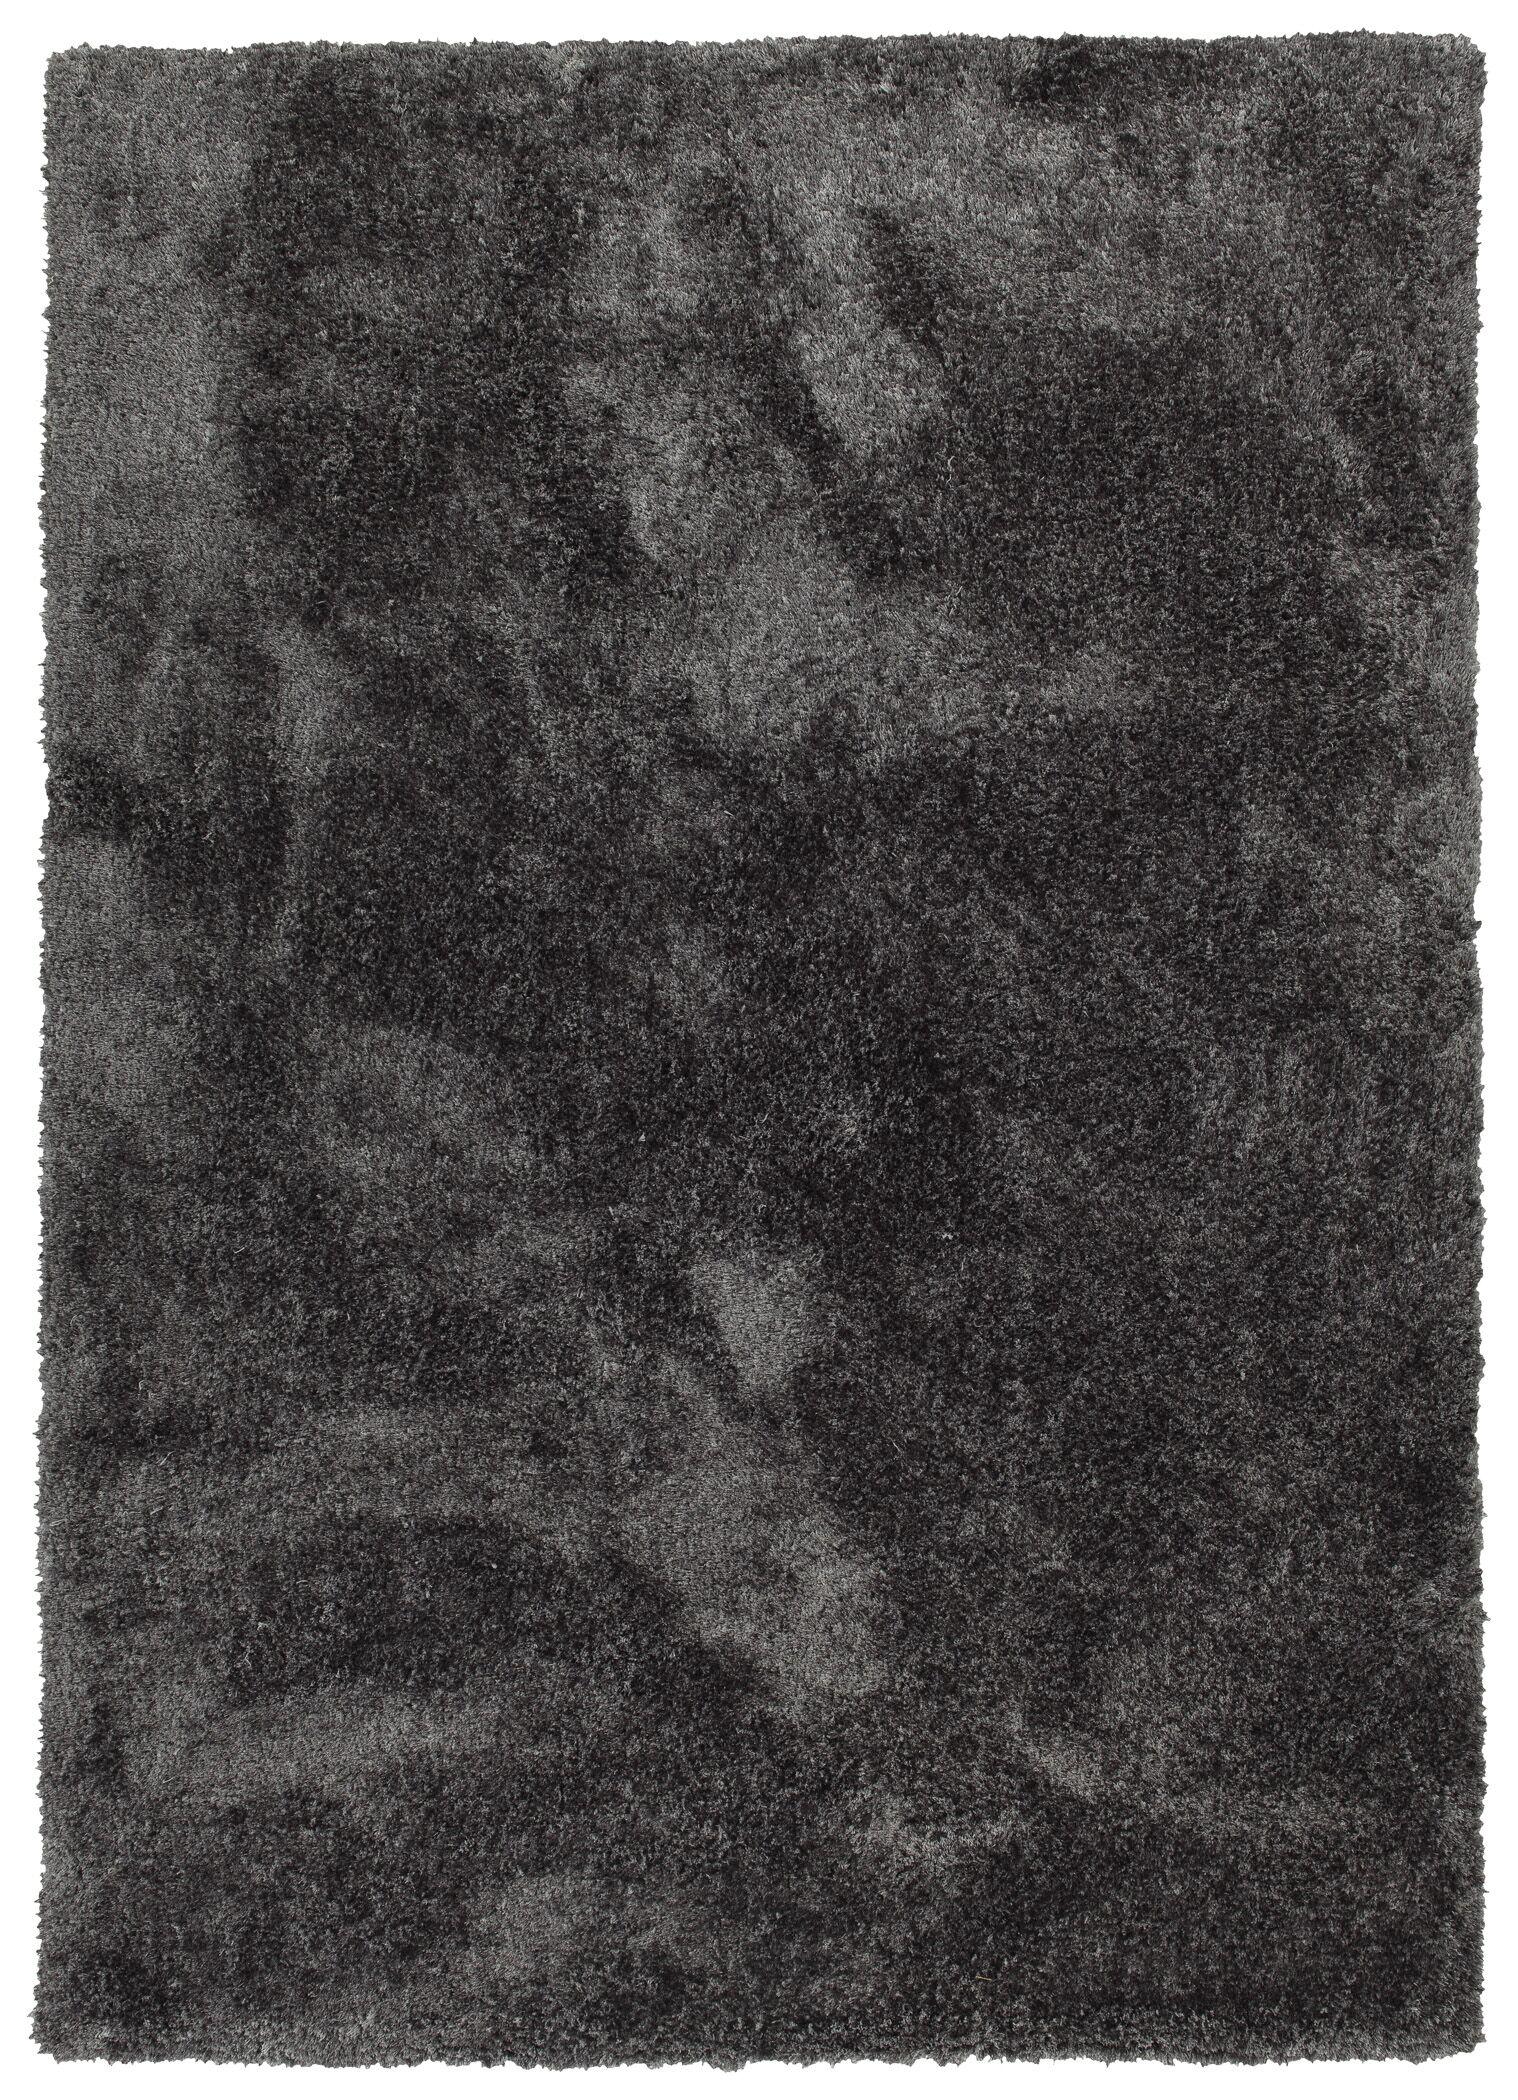 Bieber Handmade Shag Charcoal Area Rug Rug Size: Rectangle 9' x 12'